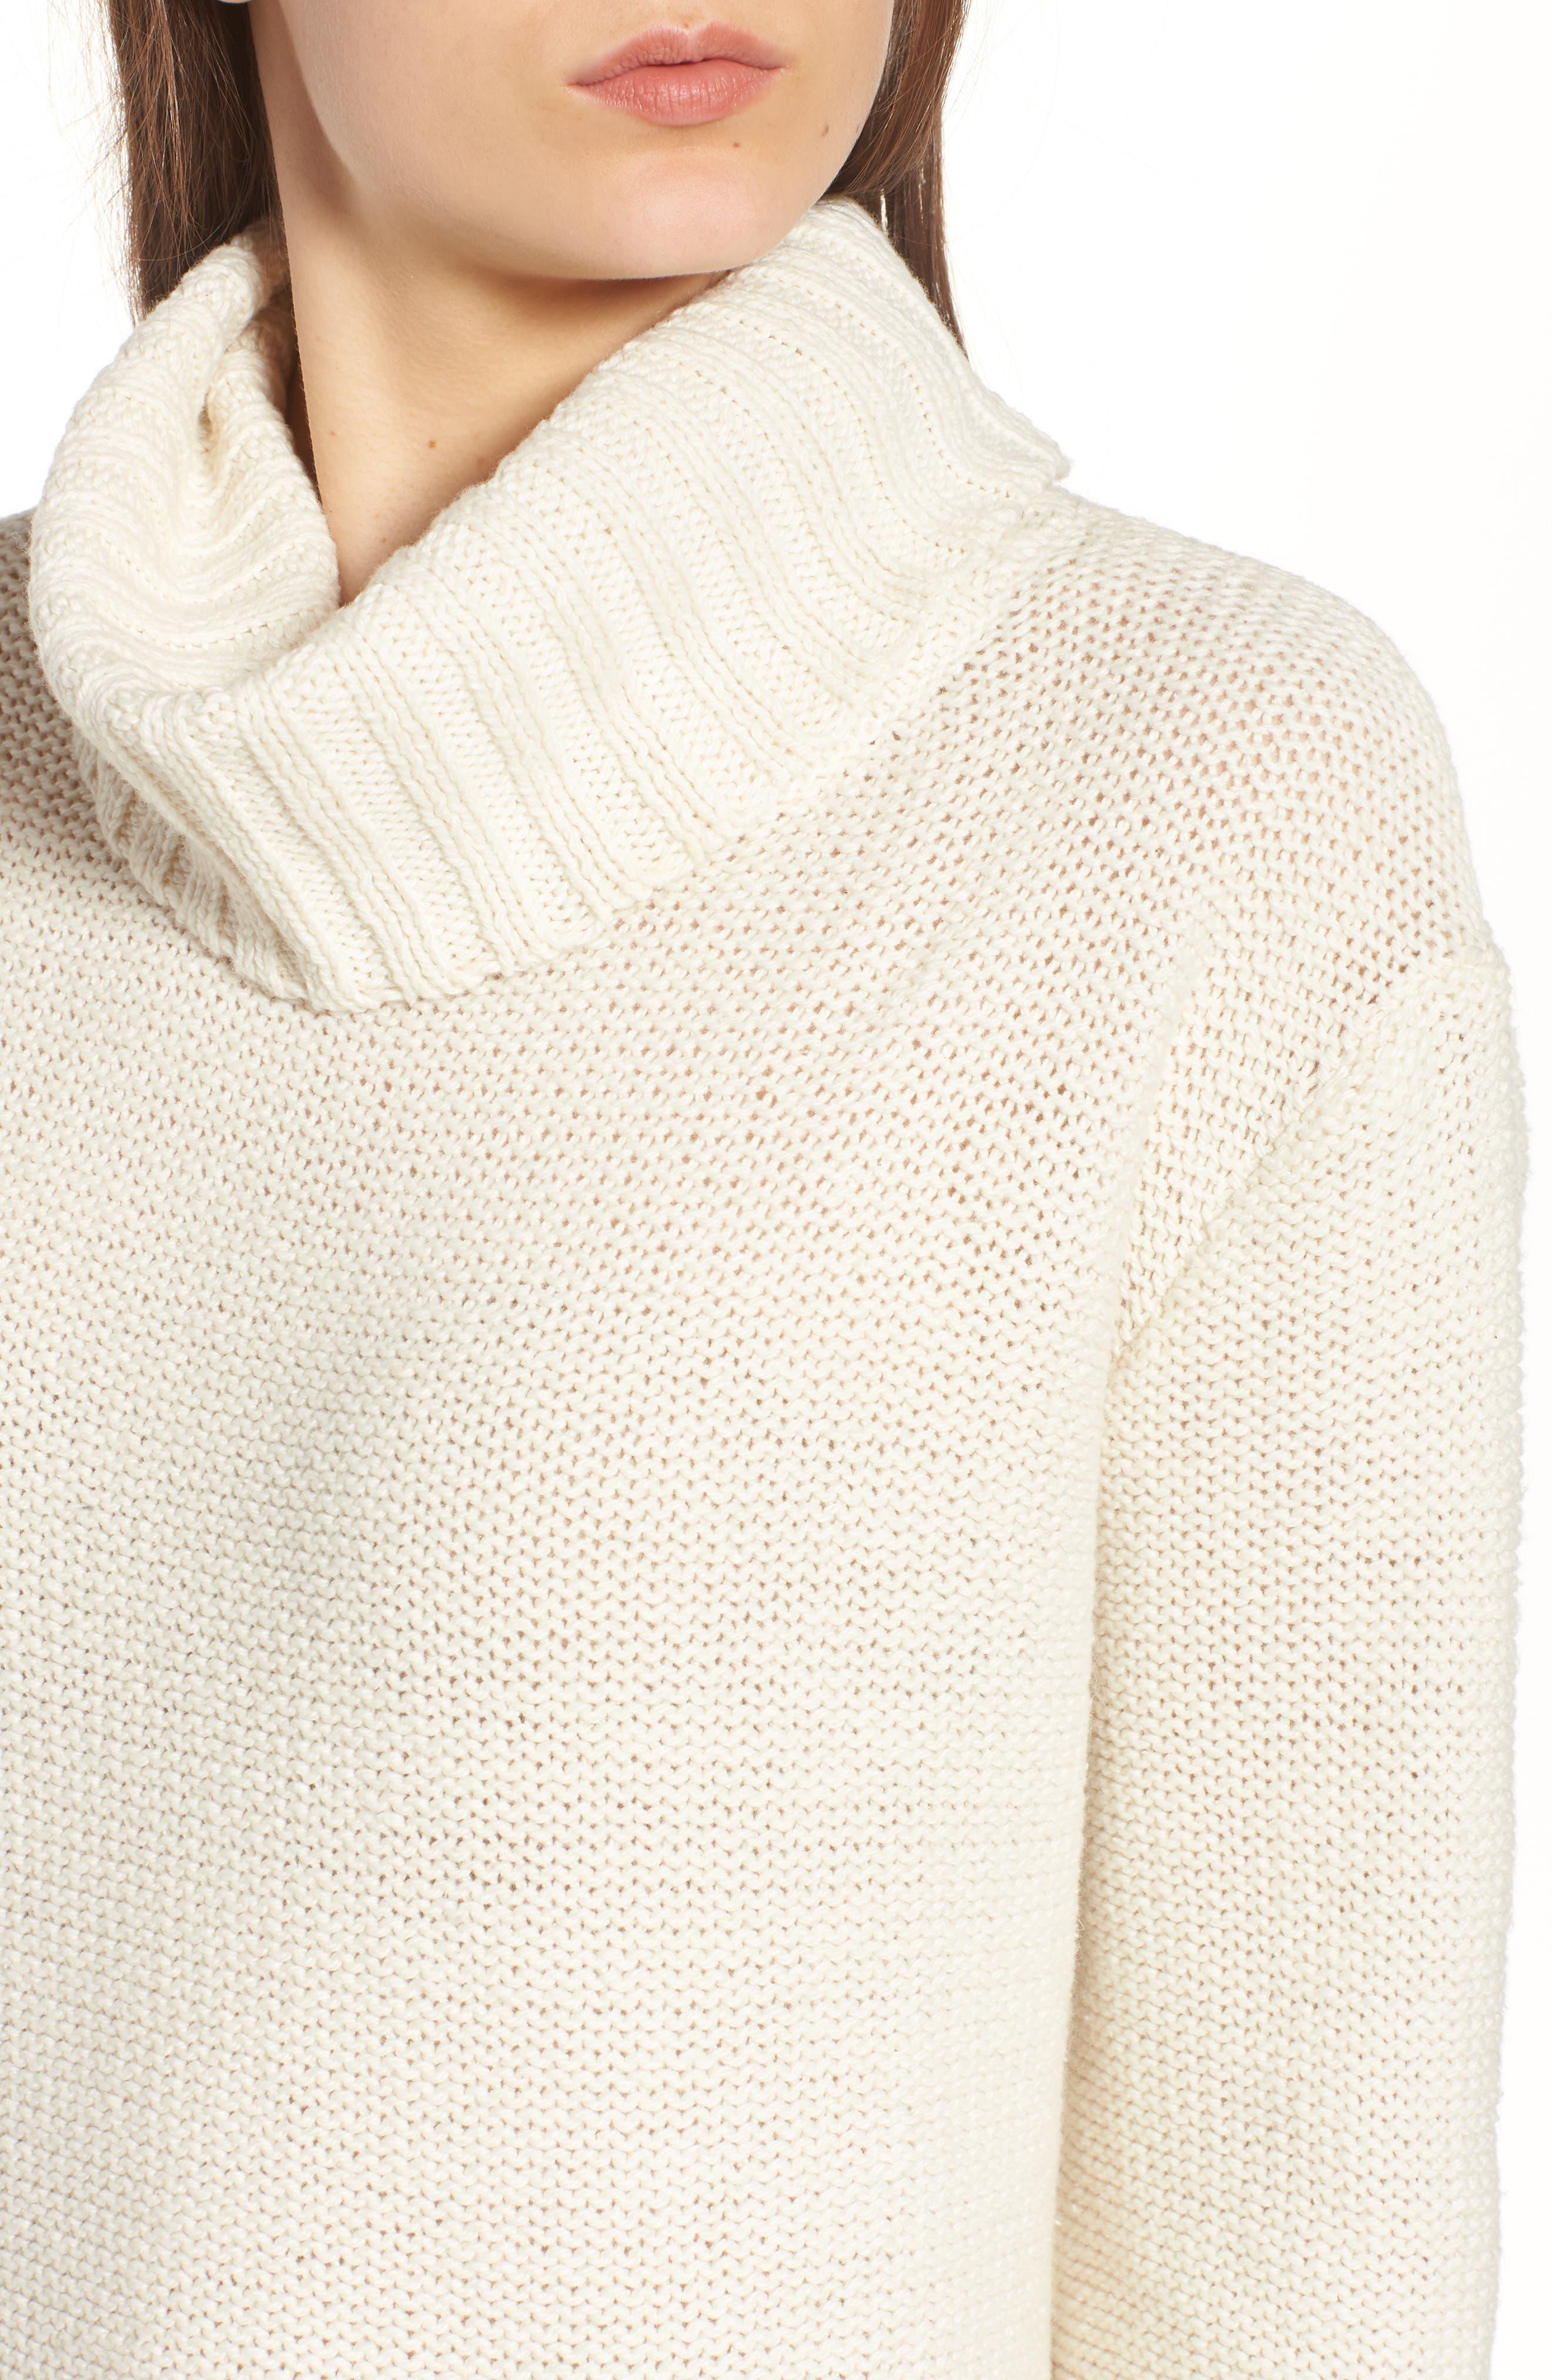 Flecked Turtleneck Sweater,                             Alternate thumbnail 4, color,                             100